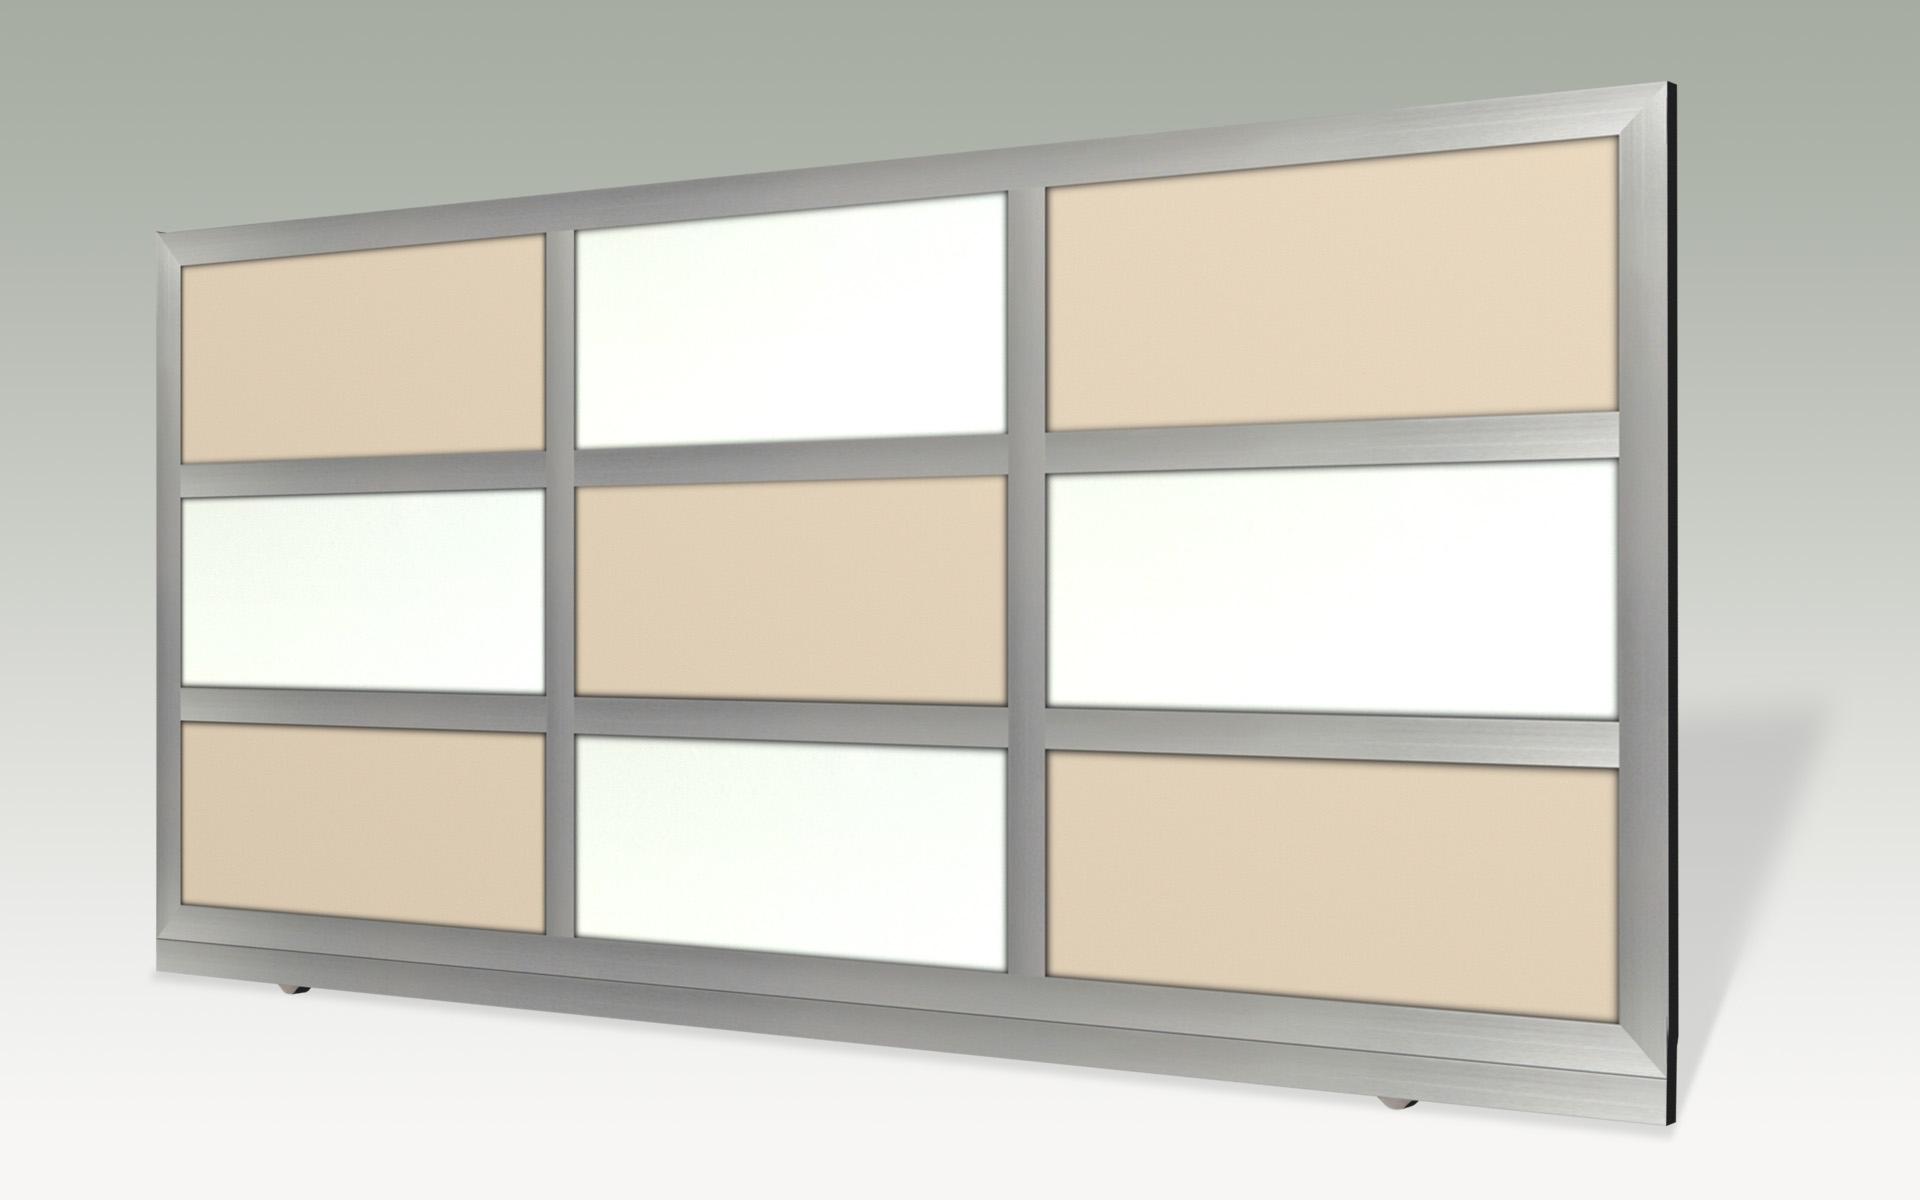 Styledoors ayloporta modern m700